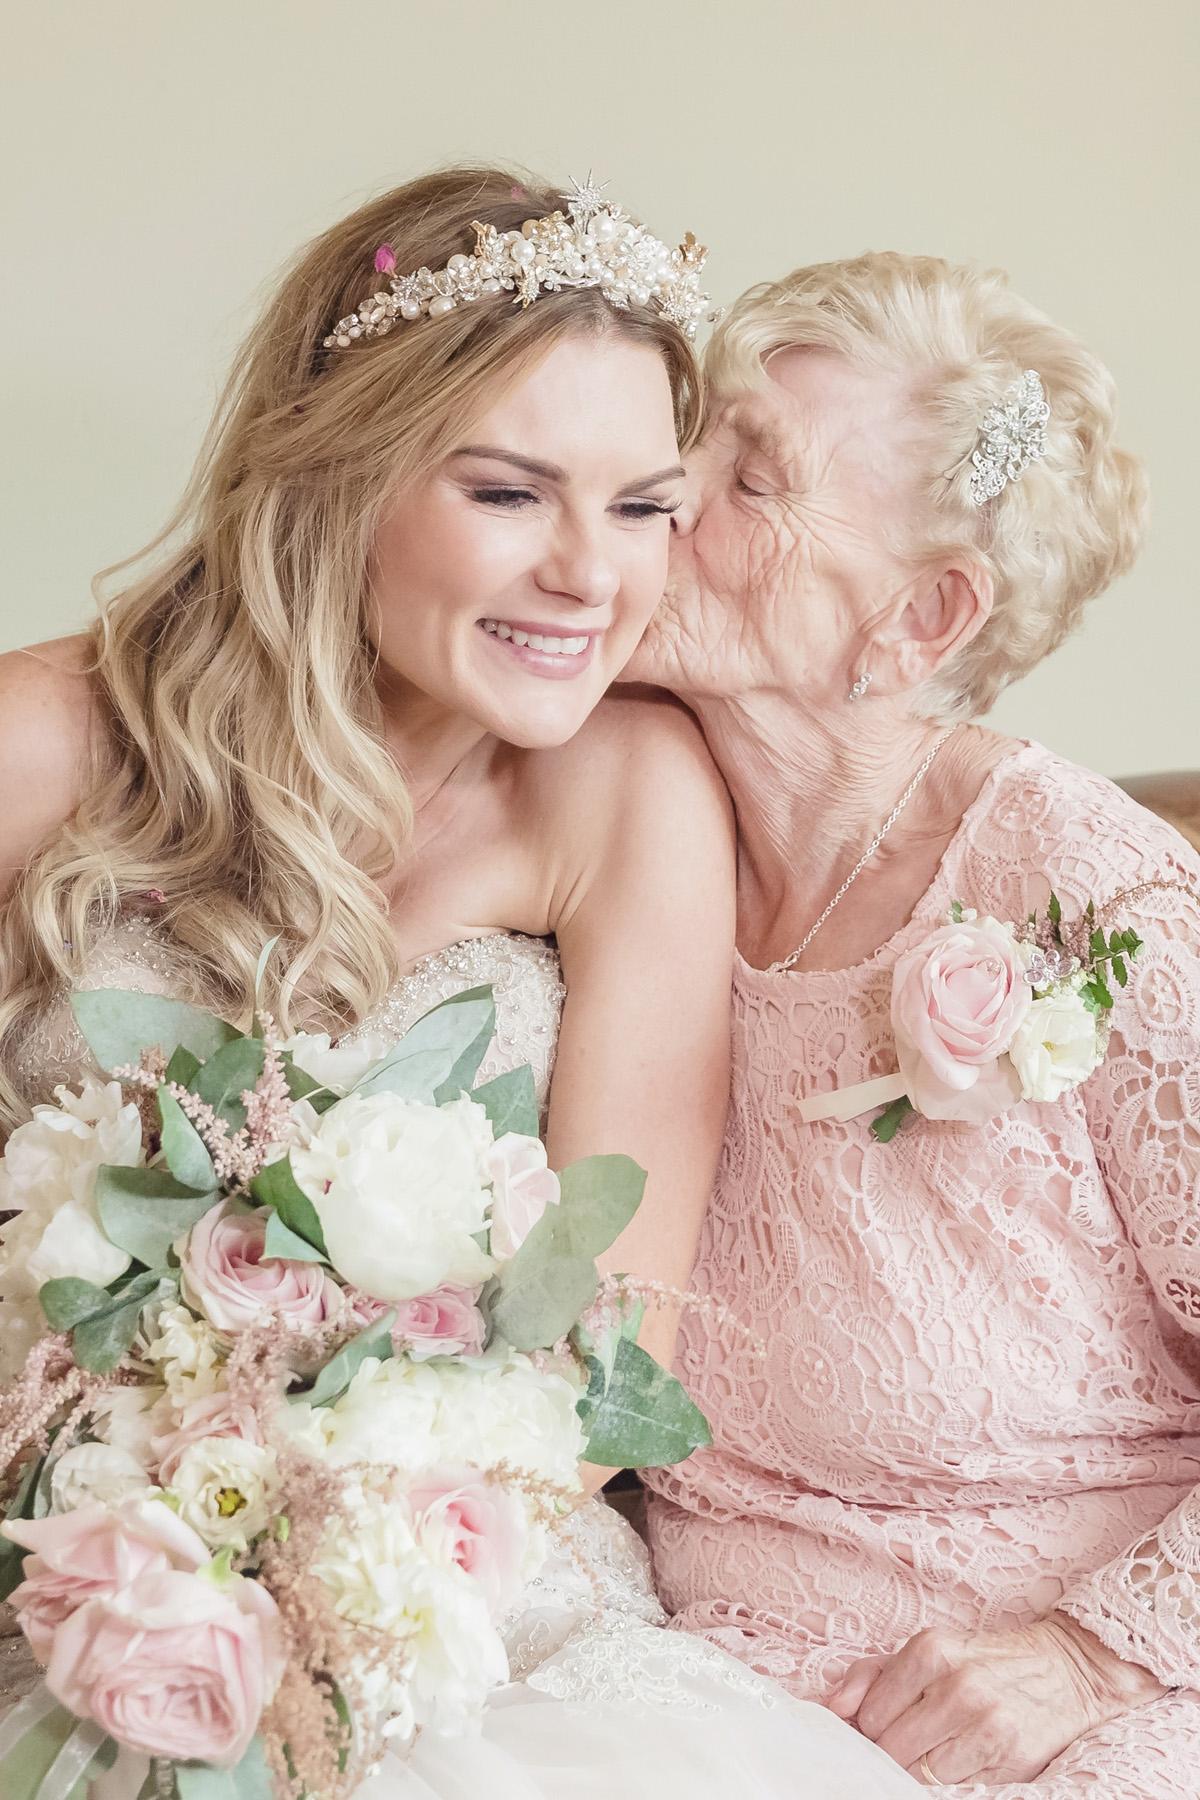 lovely moment between grandmas & bride